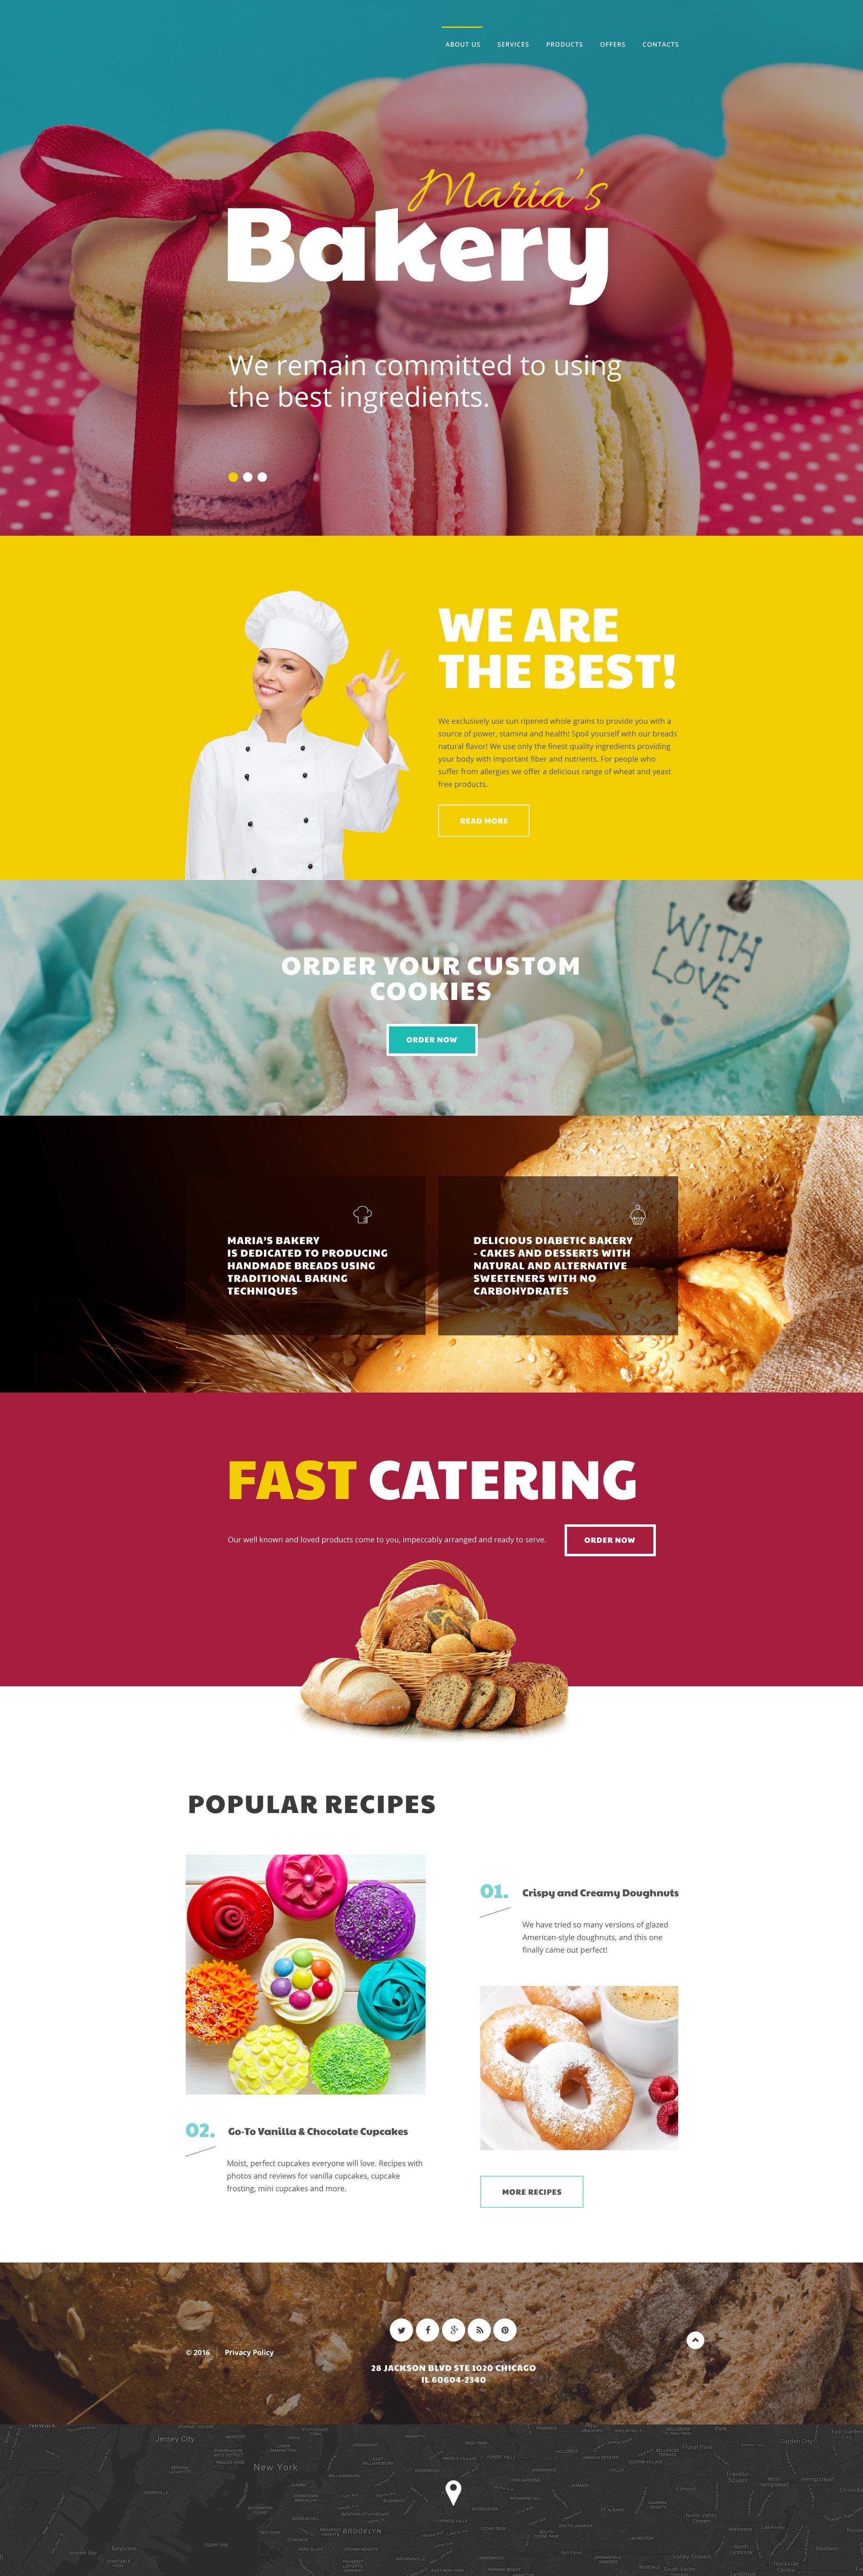 Maria's Bakery Template Web №58701 - captura de tela